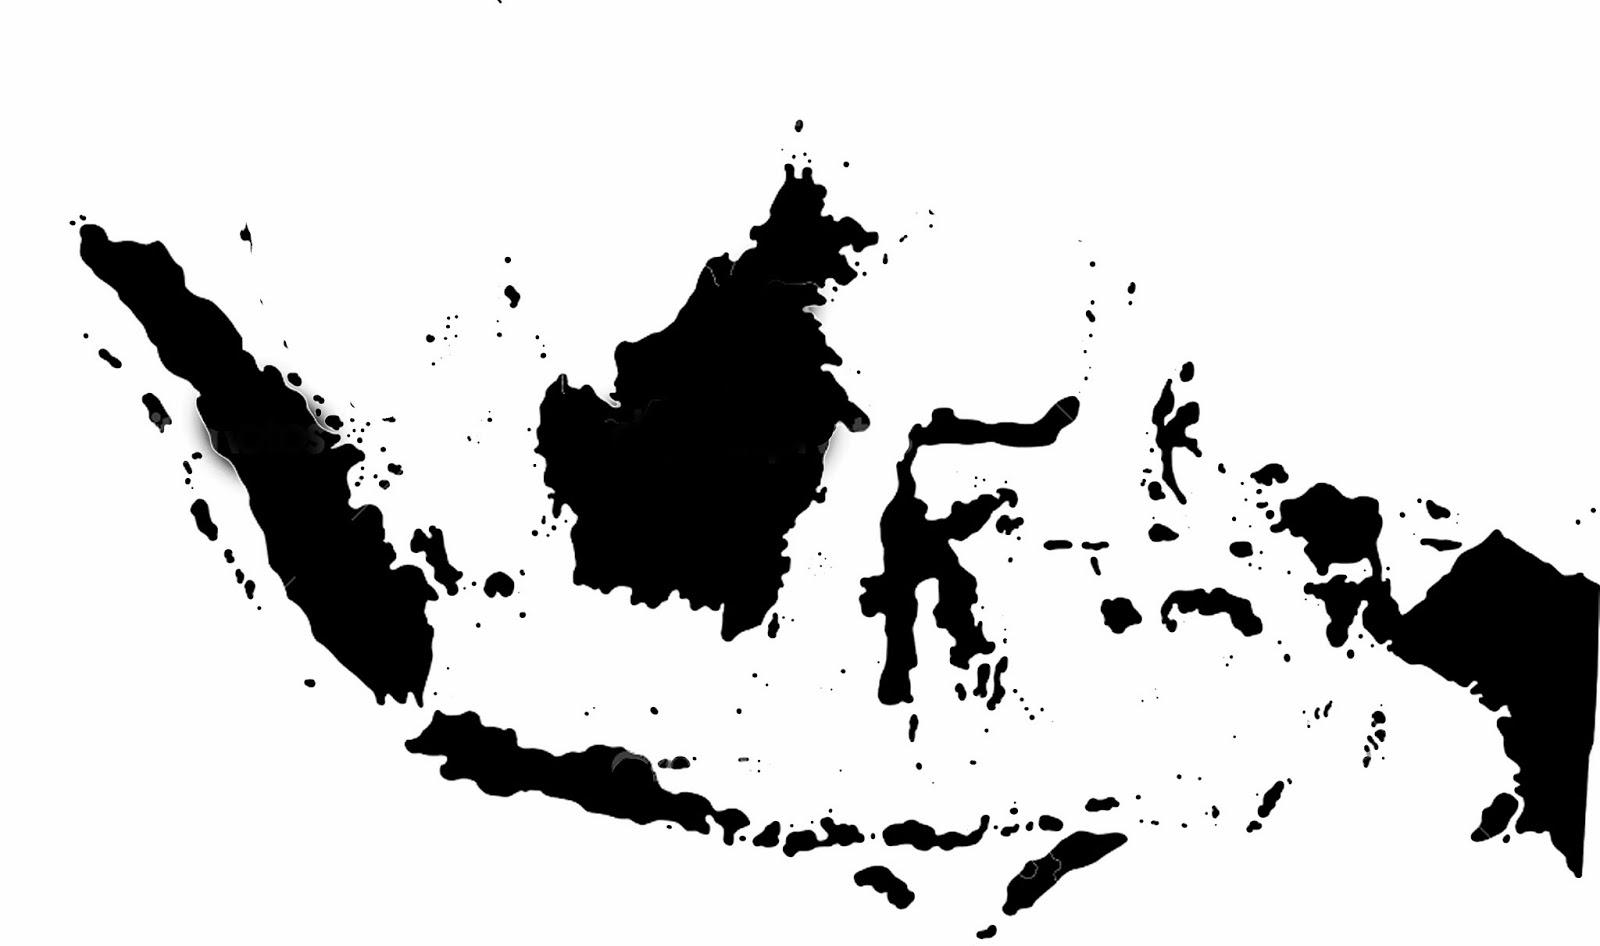 Peta logo clipart graphic transparent Peta indonesia clipart 9 » Clipart Station graphic transparent